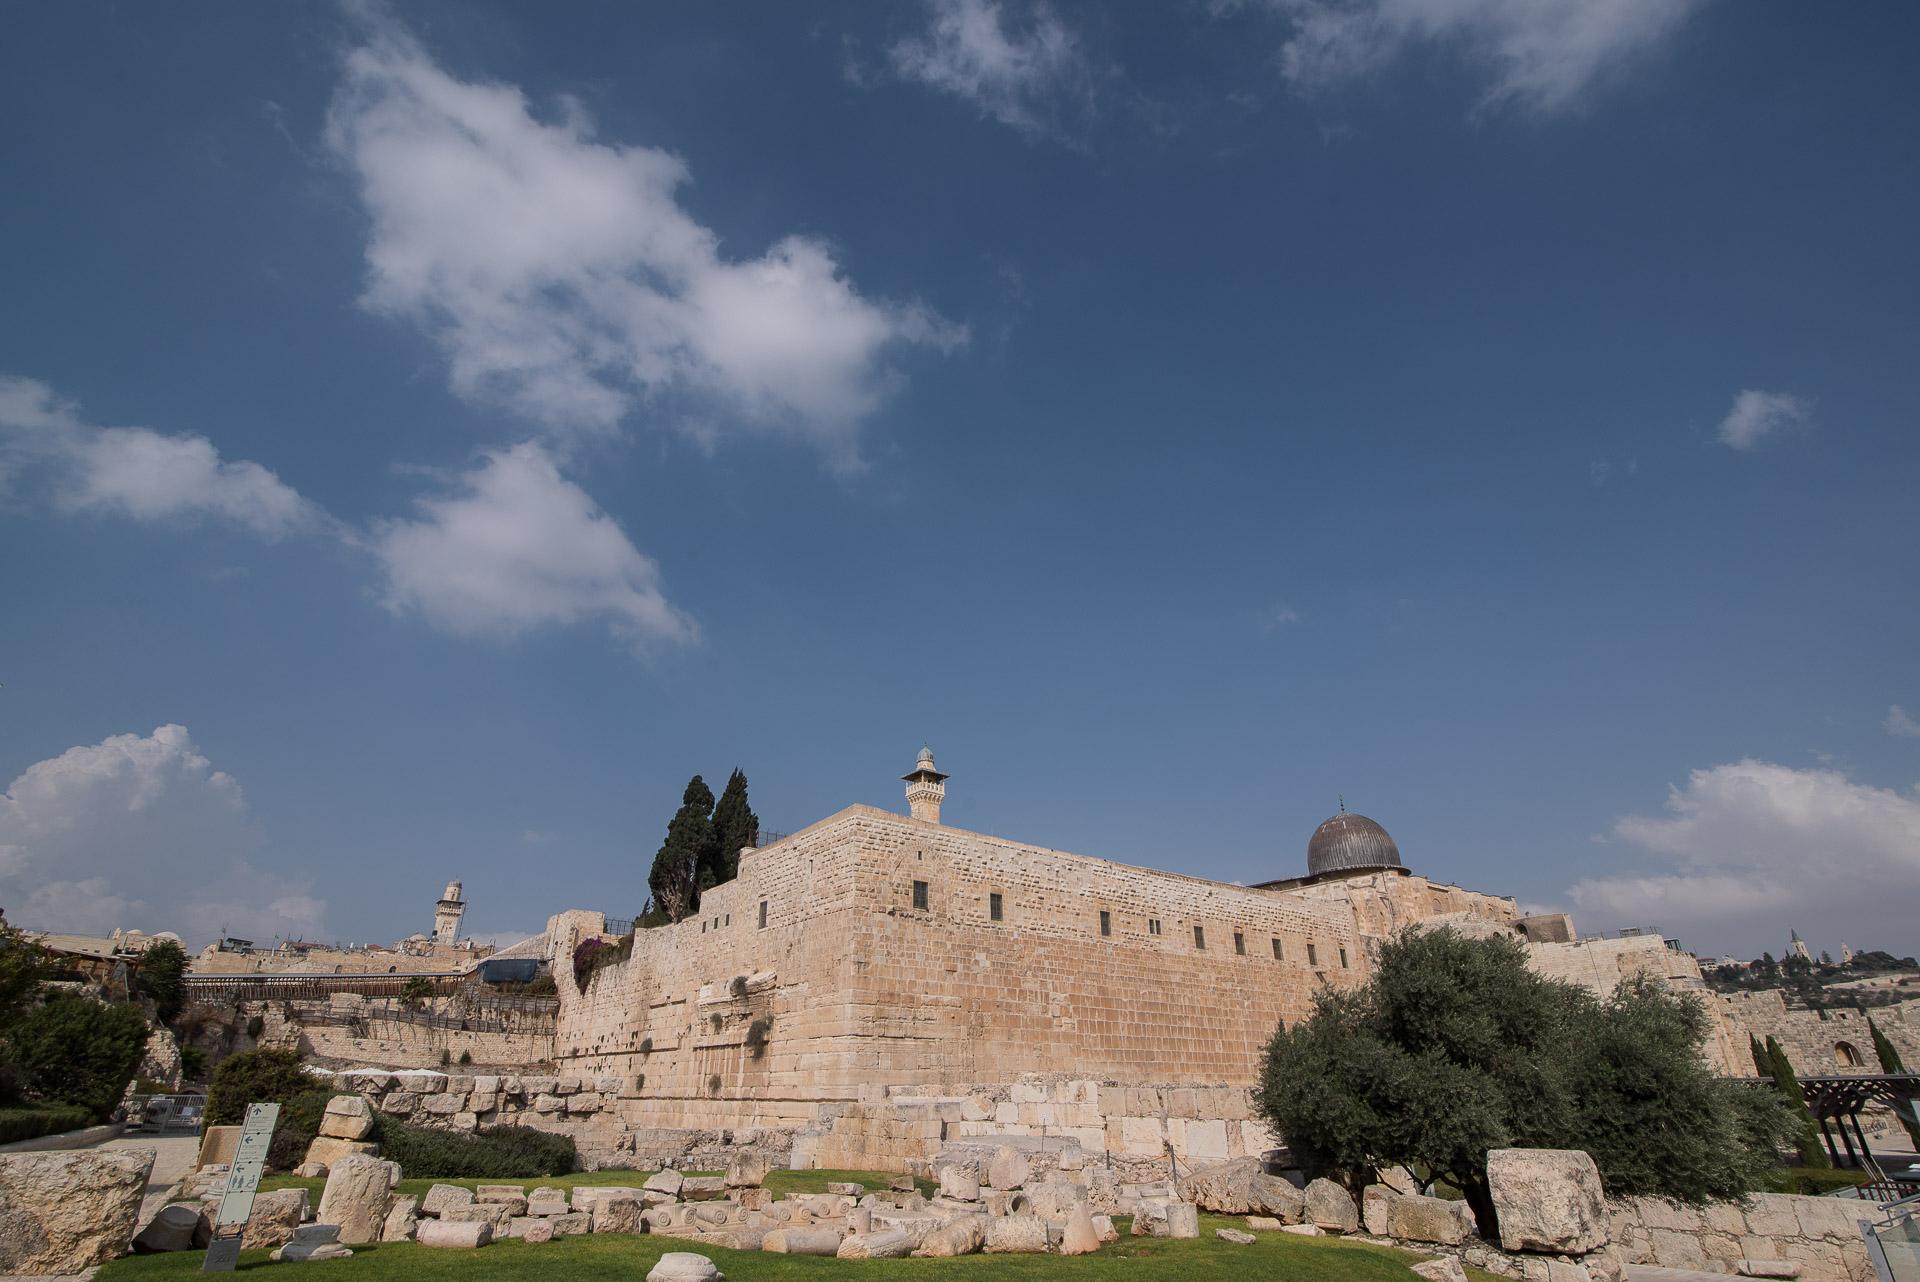 jerusalen_arqueologia10.jpg